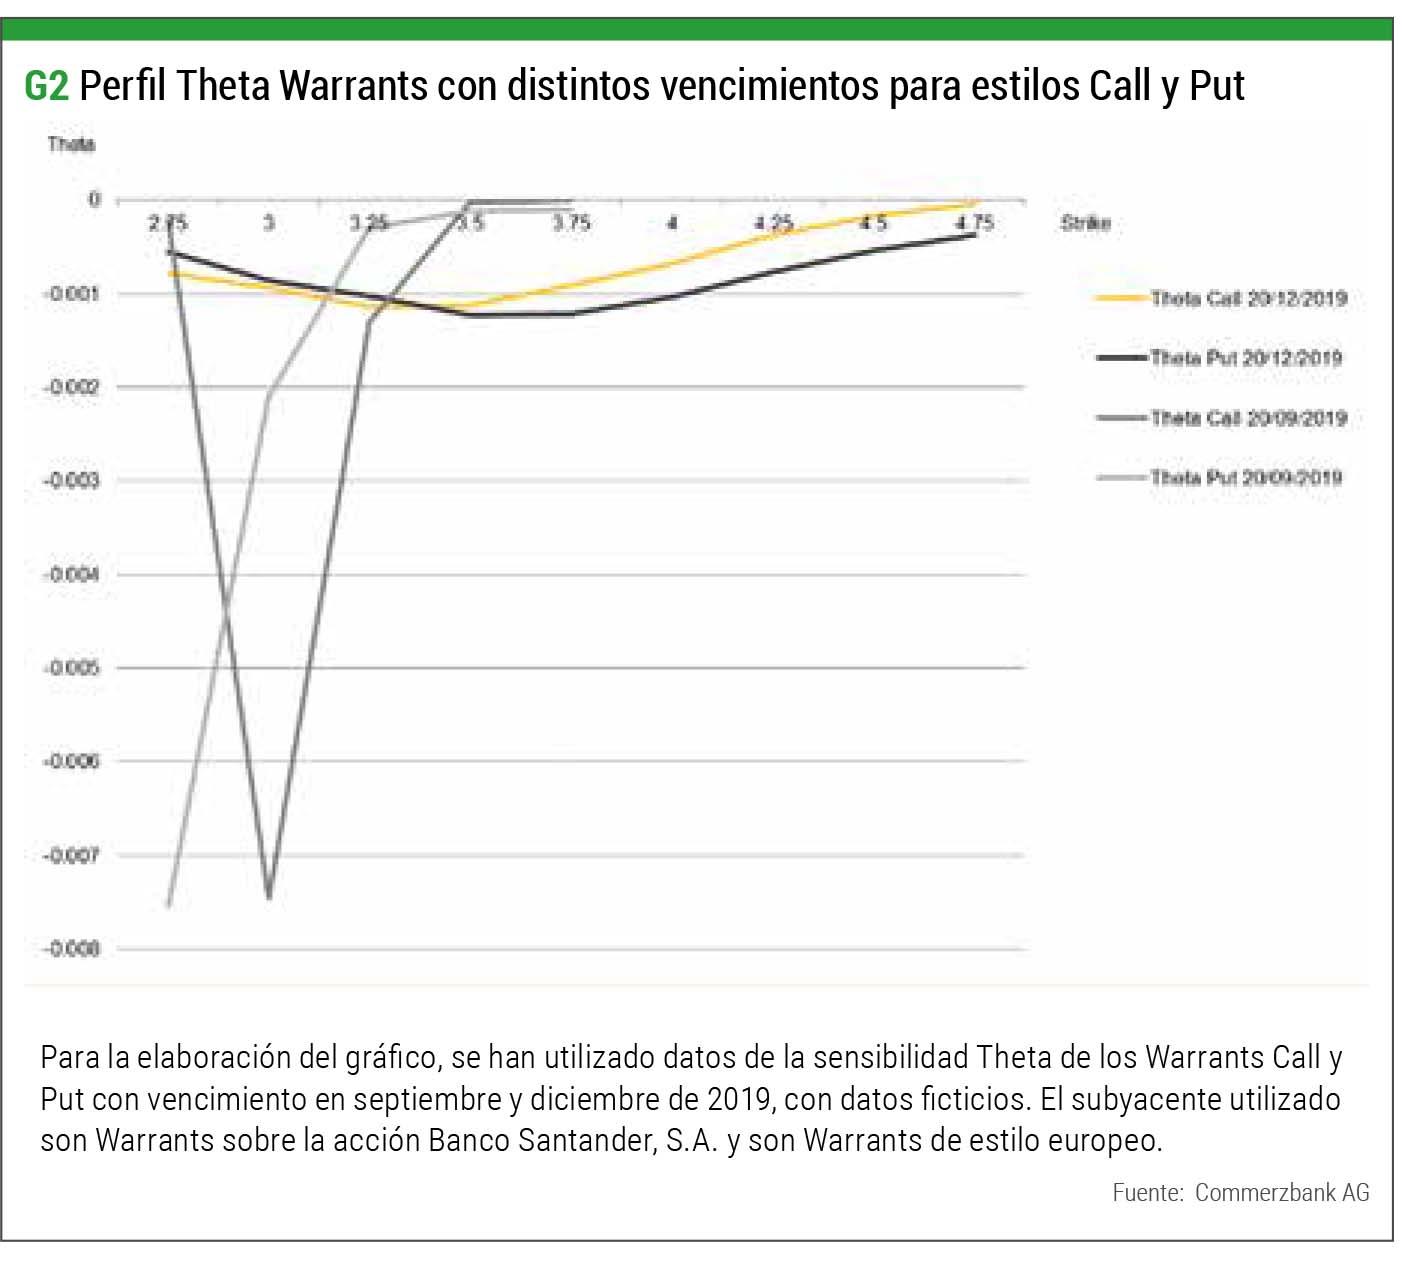 theta warrants